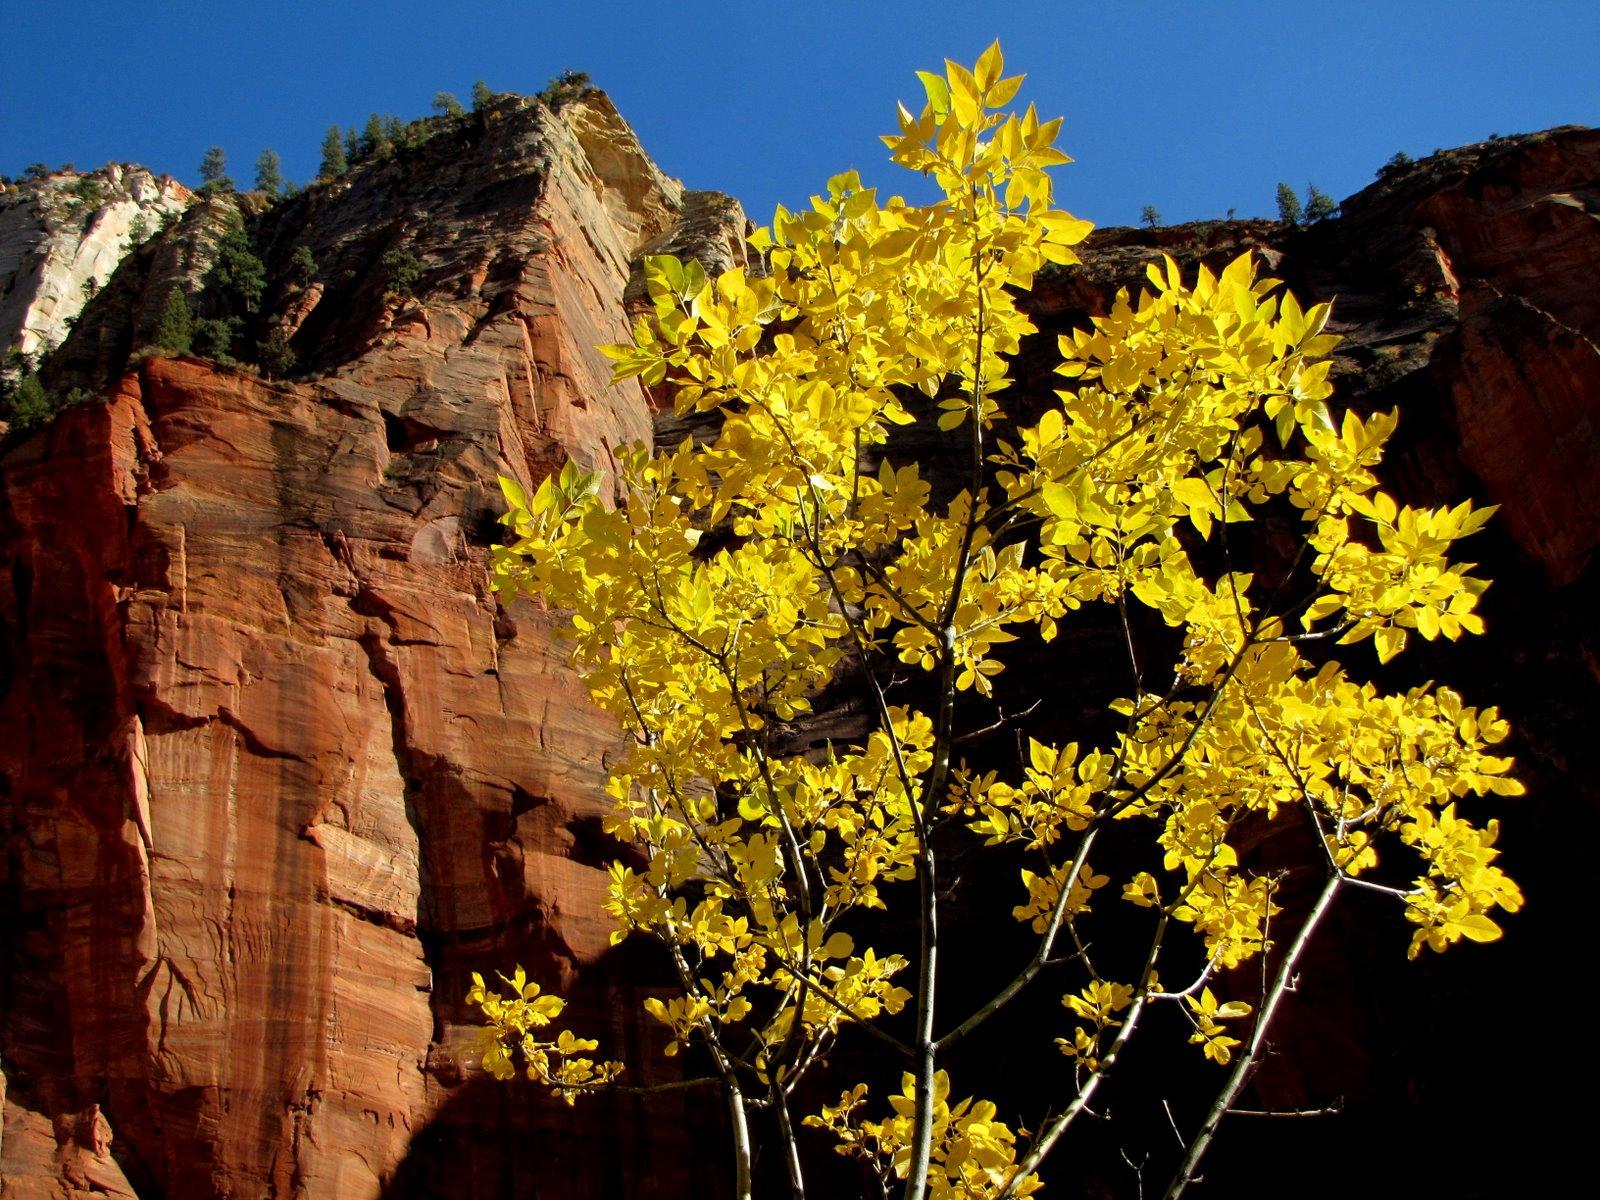 Sárga levelek  Yellow leaves